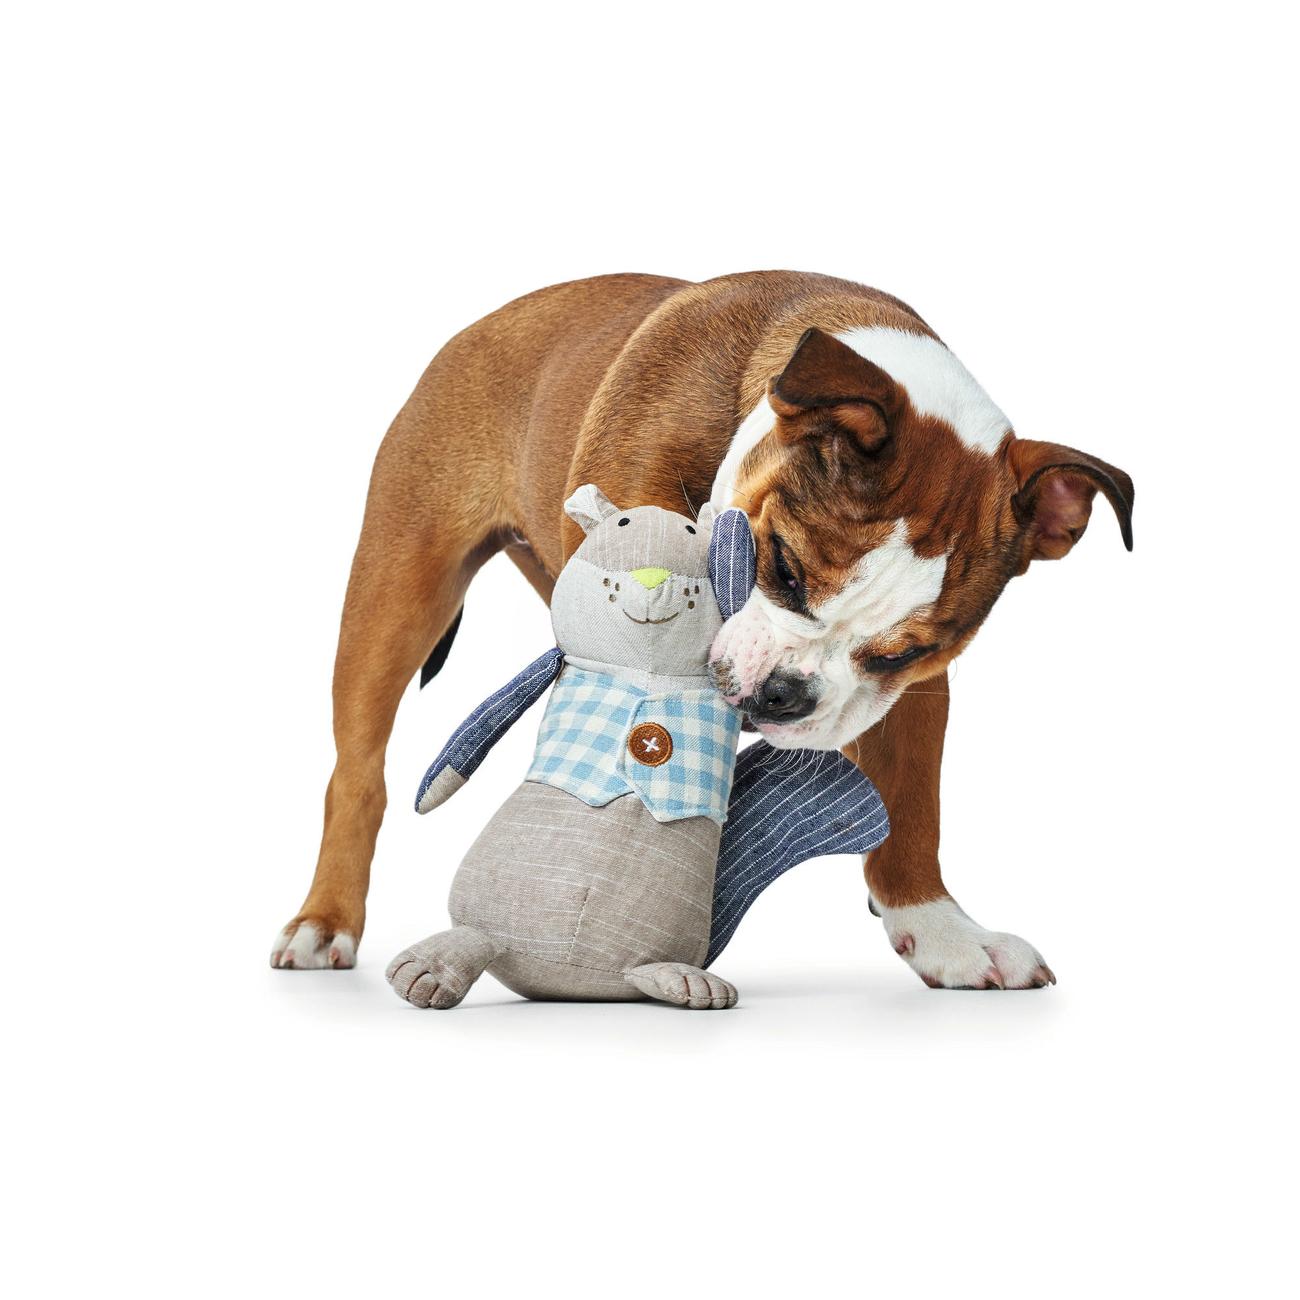 Hunter Hundespielzeug Tanami 65277, Bild 8